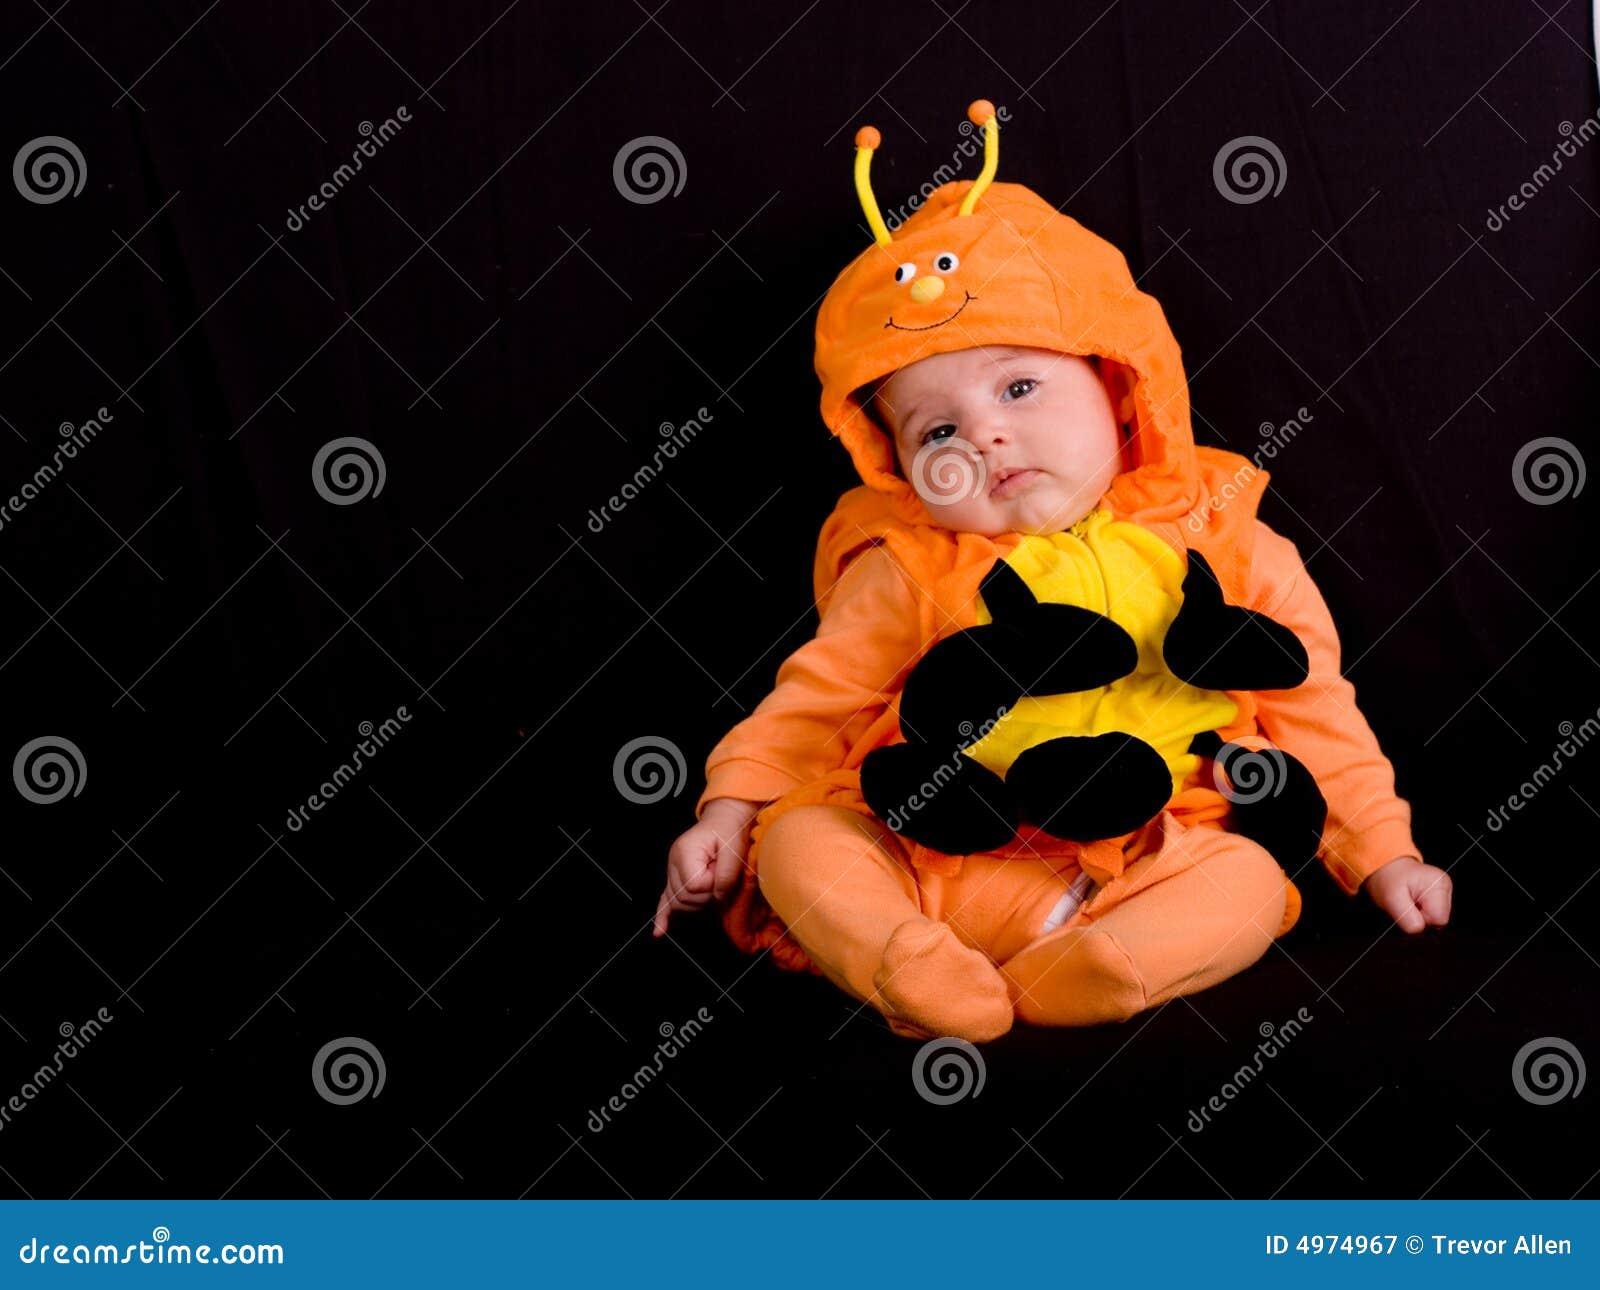 Baby In Halloween Costume 3 Stock Image - Image of girl